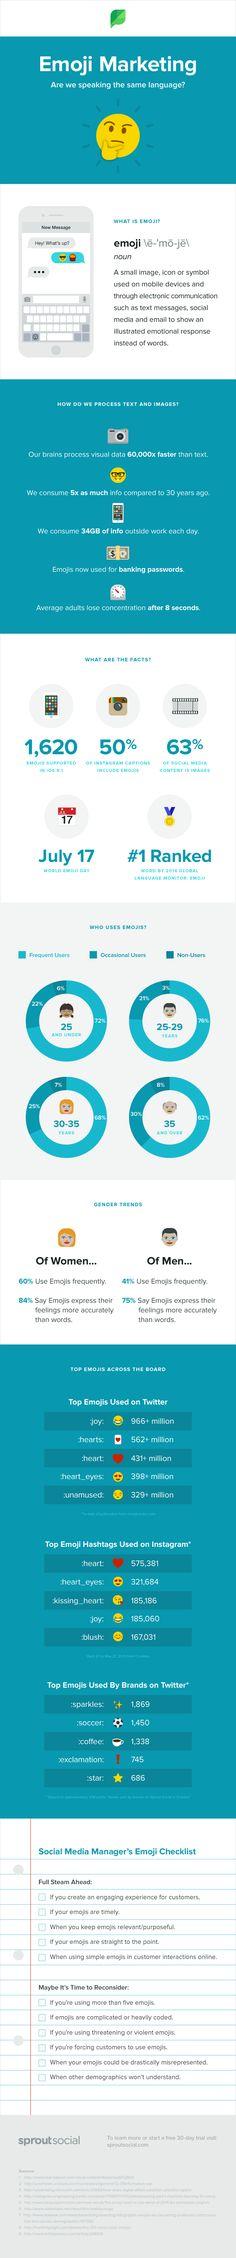 Visual content is in! Emoji Marketing: Are We Speaking the Same Language #emoji #marketing